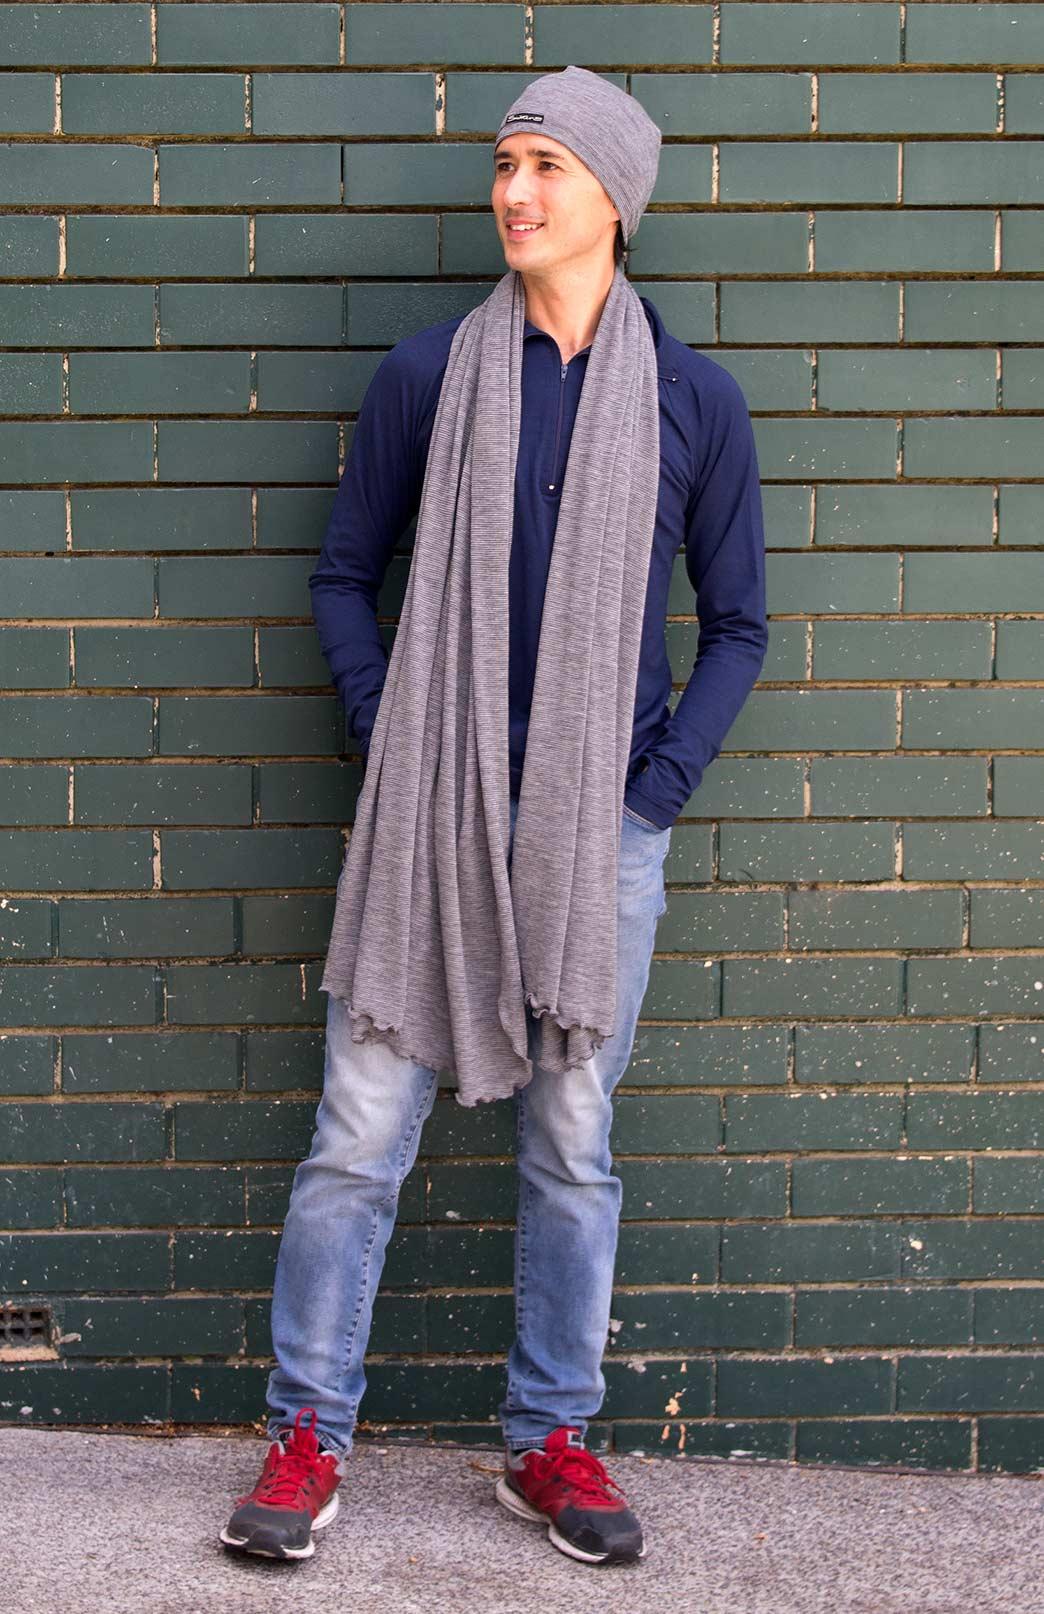 Matching Scarf & Beanie Set - Superfine Merino Wool Matching Scarf and Thermal Beanie Set - Smitten Merino Tasmania Australia